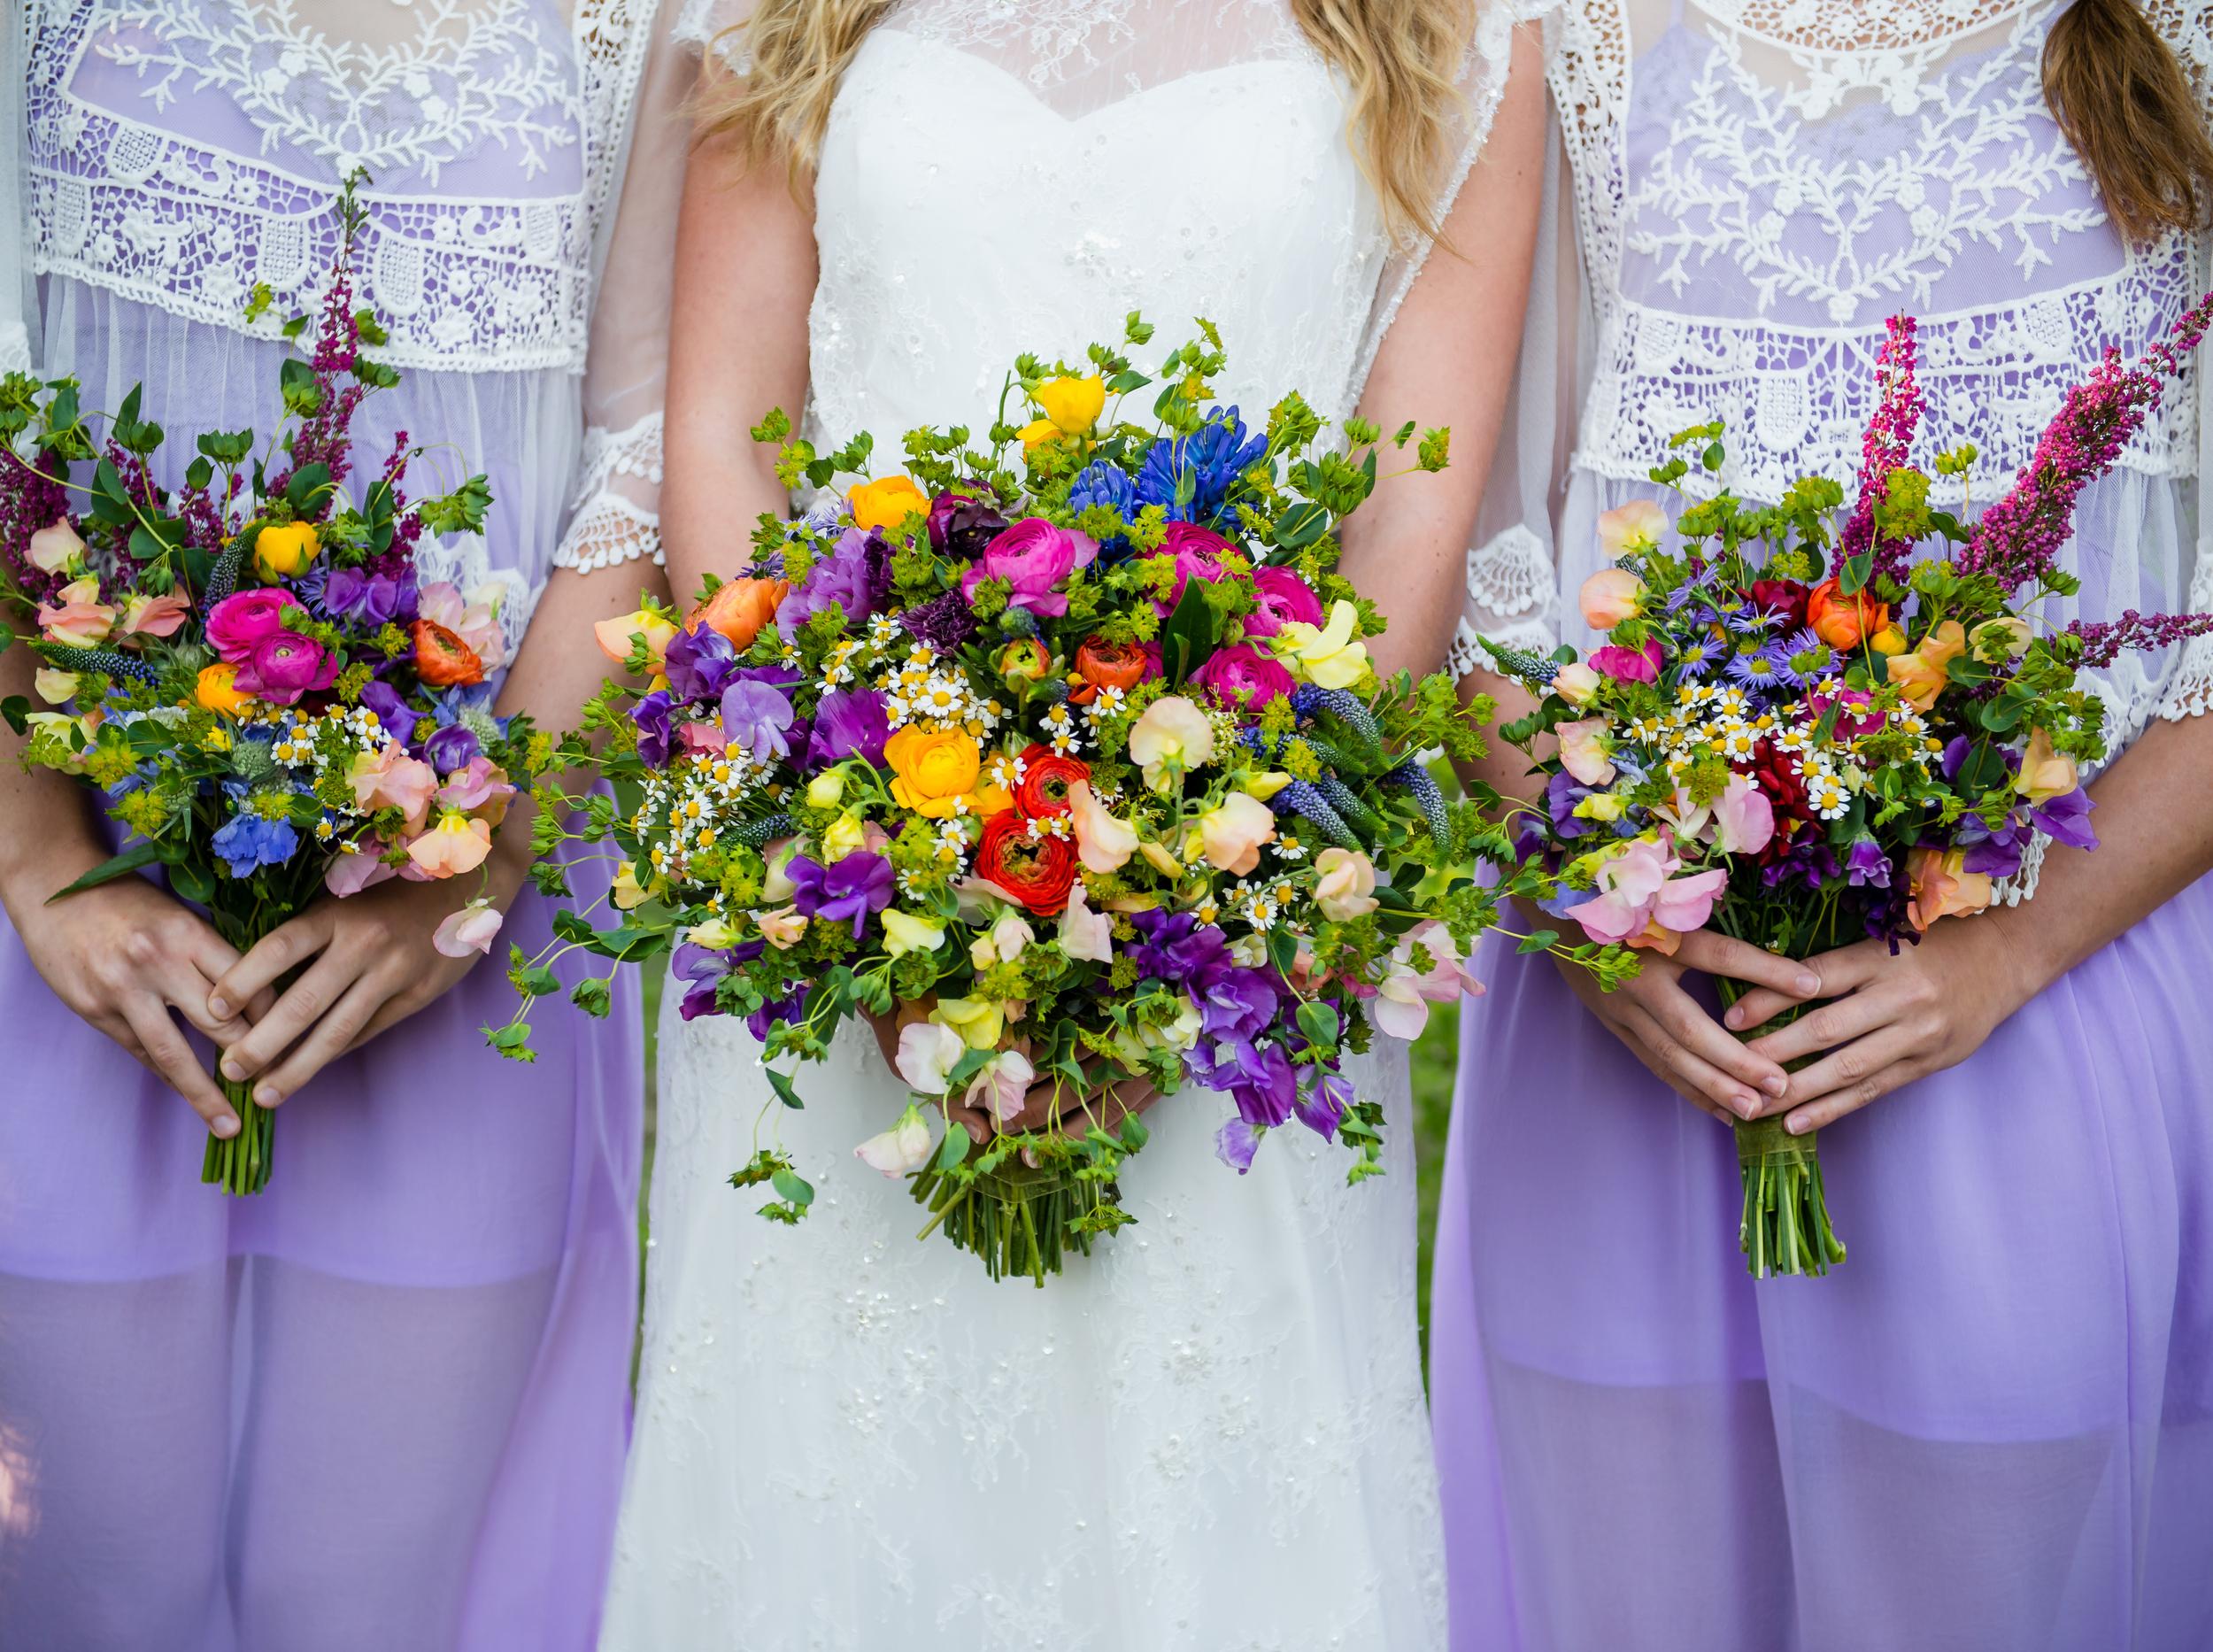 Seasonal Flowers Prefect For Your Spring Wedding Villa St Clair